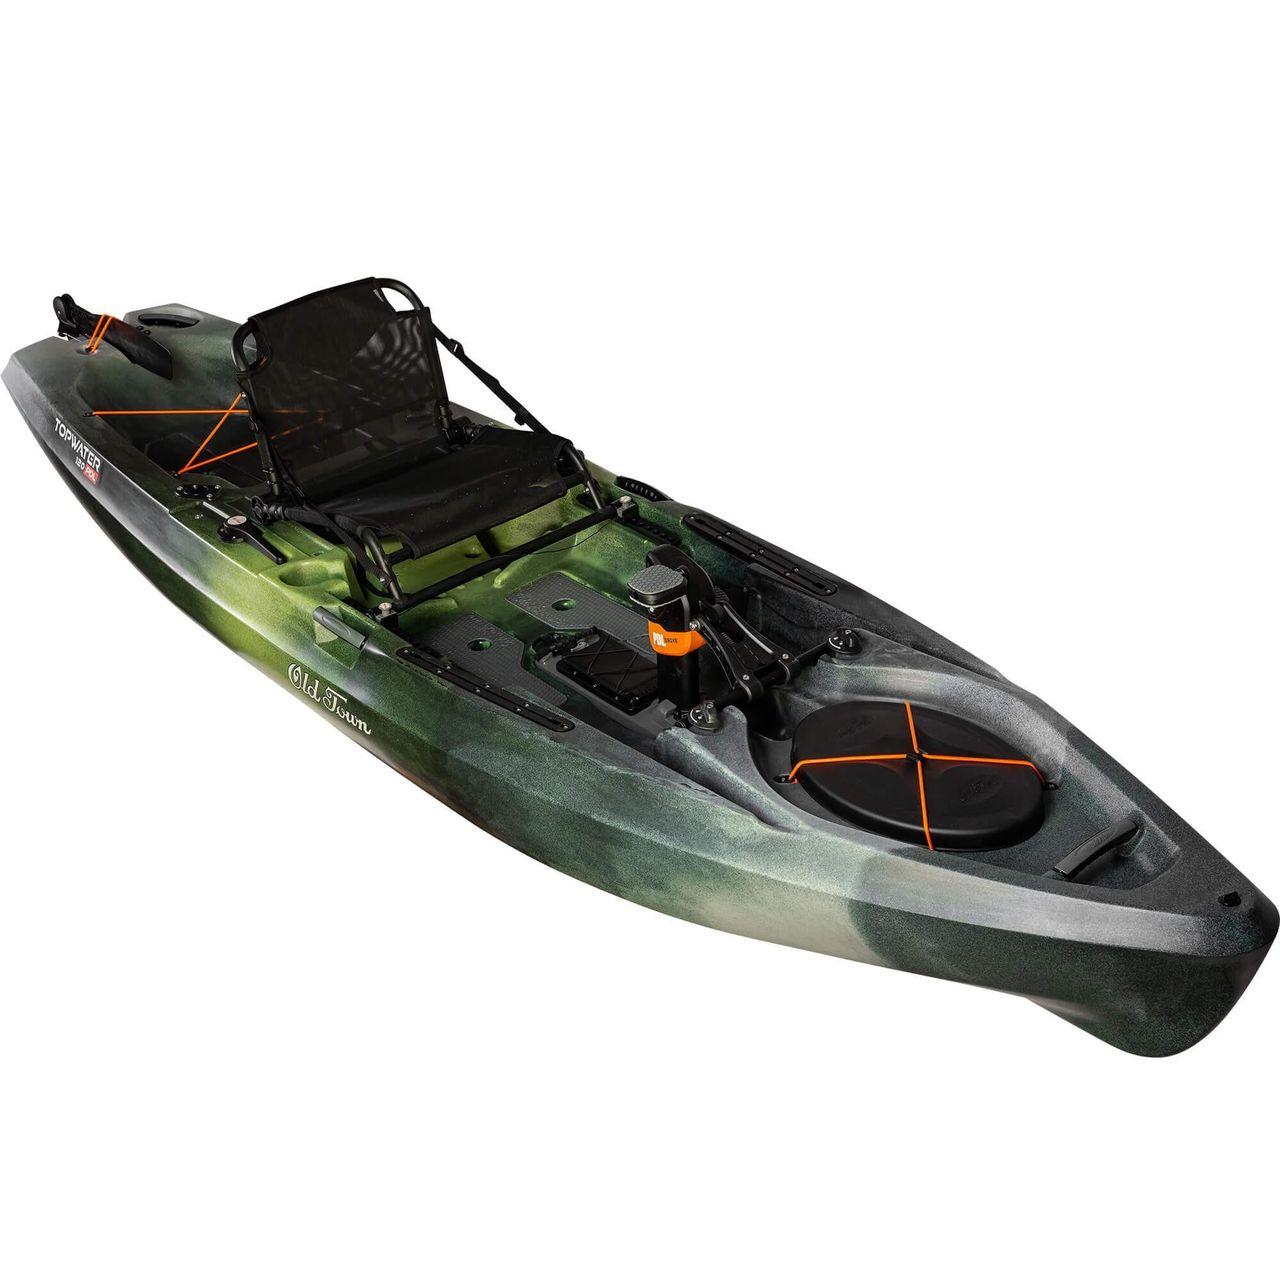 2019 New Old Town Topwater 120 PDLTopwater 120 PDL Kayak